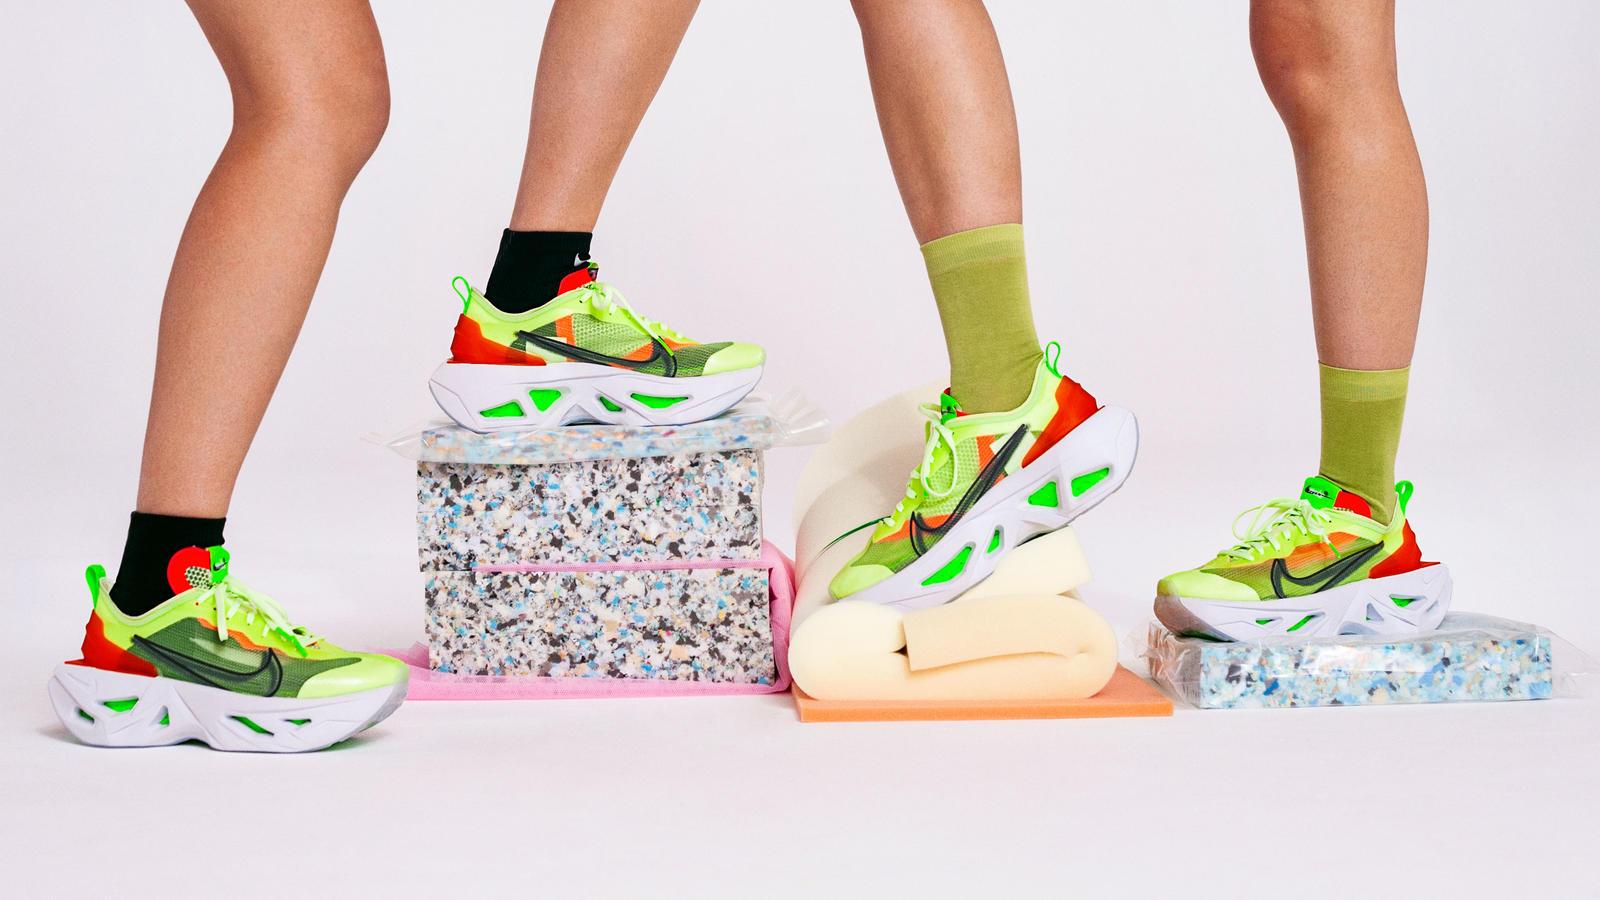 NikeNews_FeaturedFootwear_ZoomXVistaGrind_Re_1_hd_1600.jpg